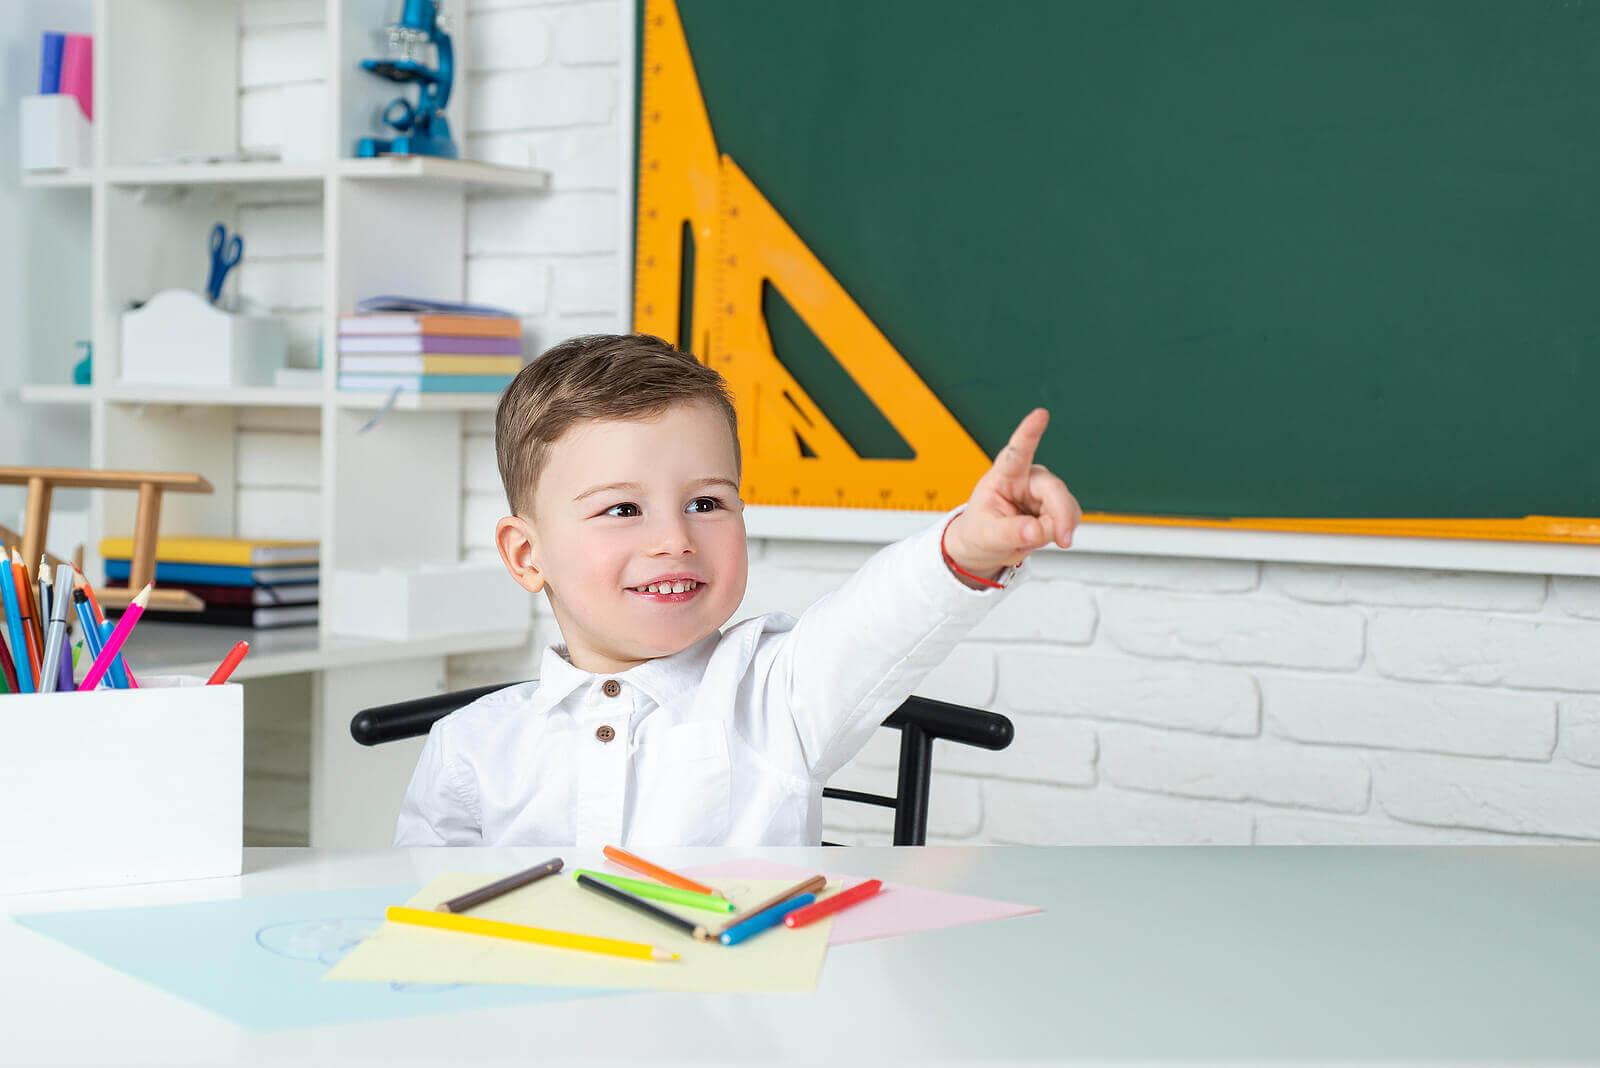 The Glenn Doman Method of Alternative Education